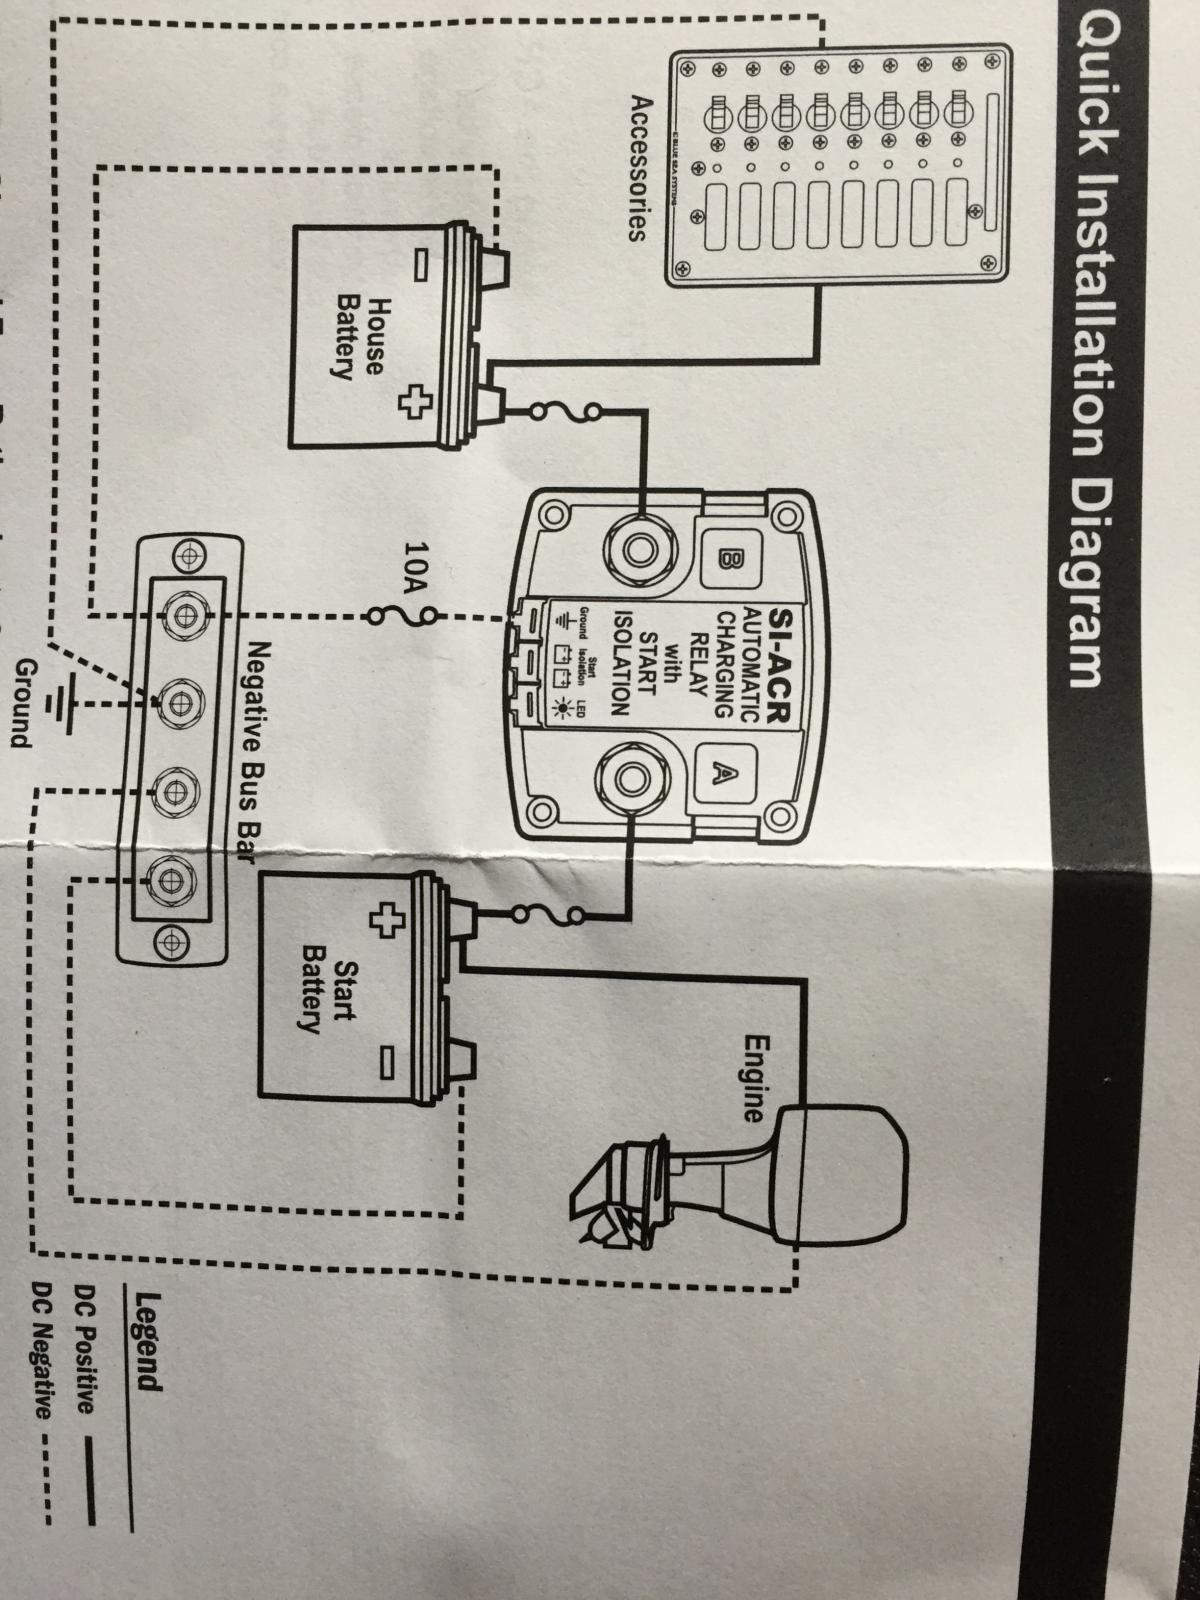 TheSambacom Gallery Blue Sea ACR Wiring Diagram - Blue sea acr wiring diagram